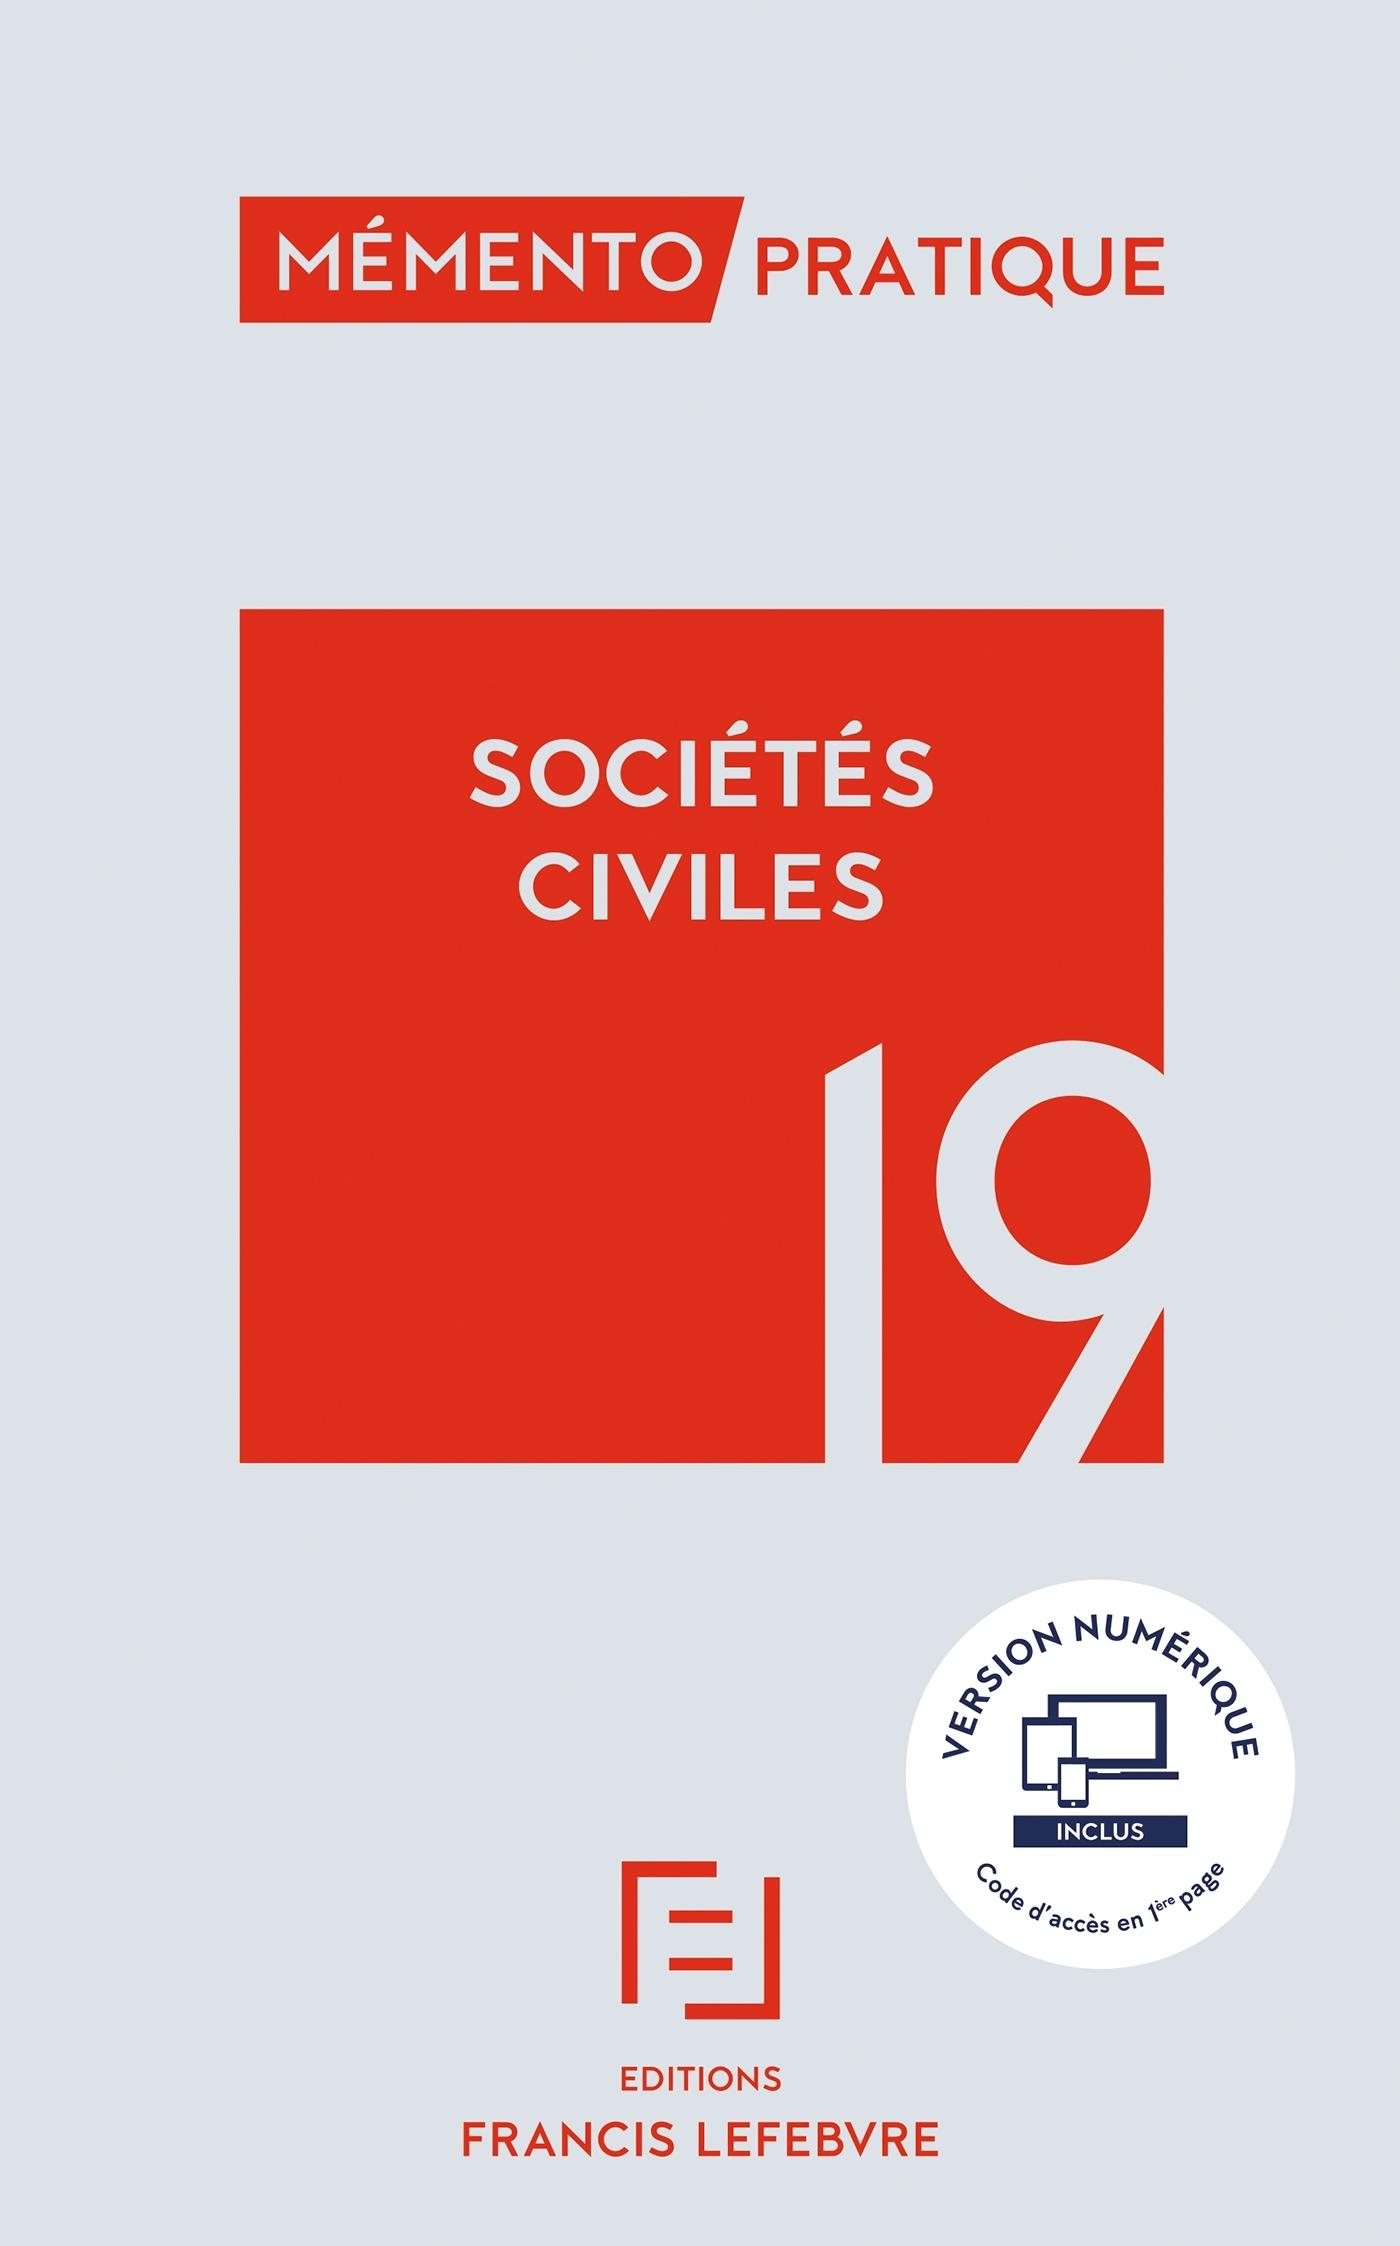 MEMENTO SOCIETES CIVILES 2019